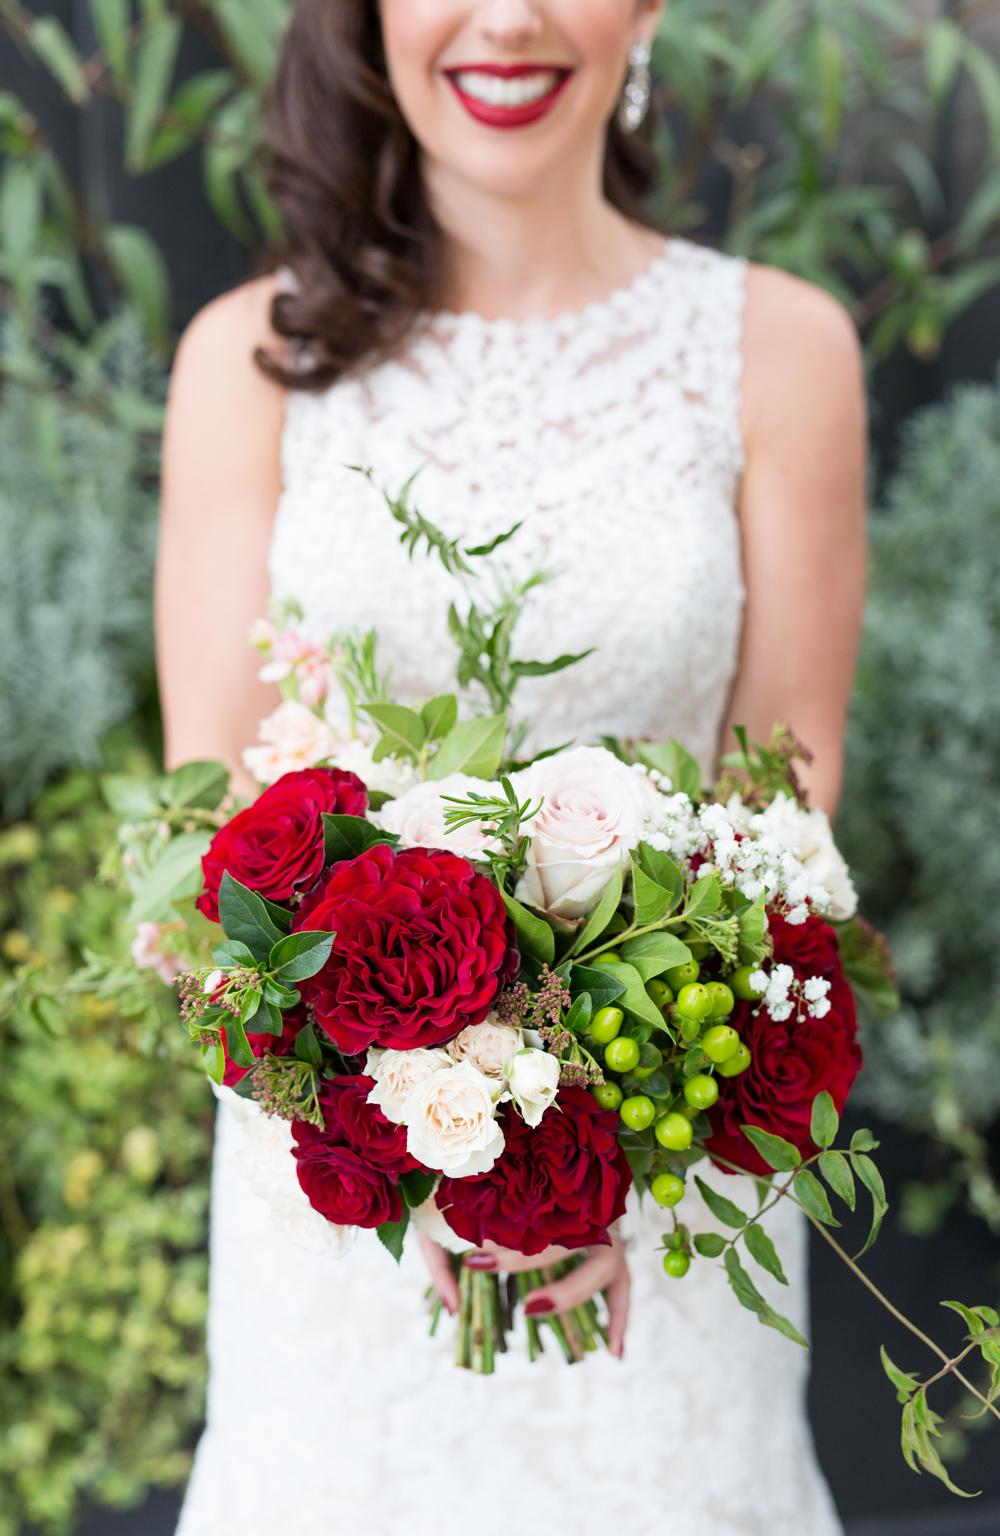 www.skyebluphotography.com    www.imaginesb.com